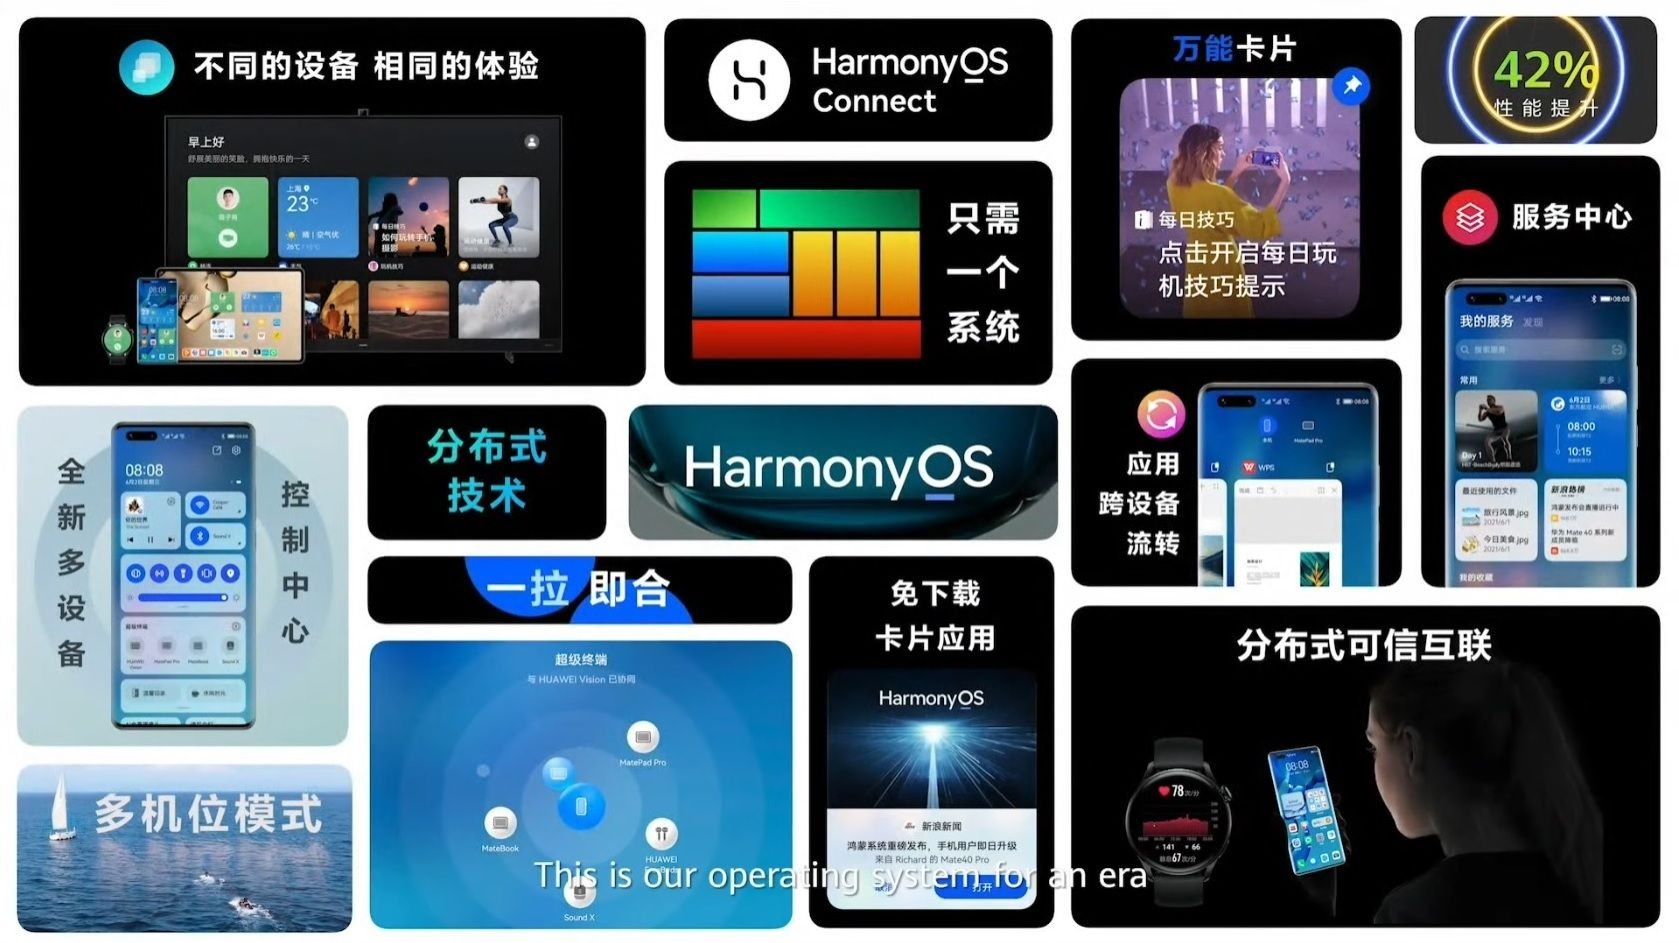 HarmonyOS fonctionnalites